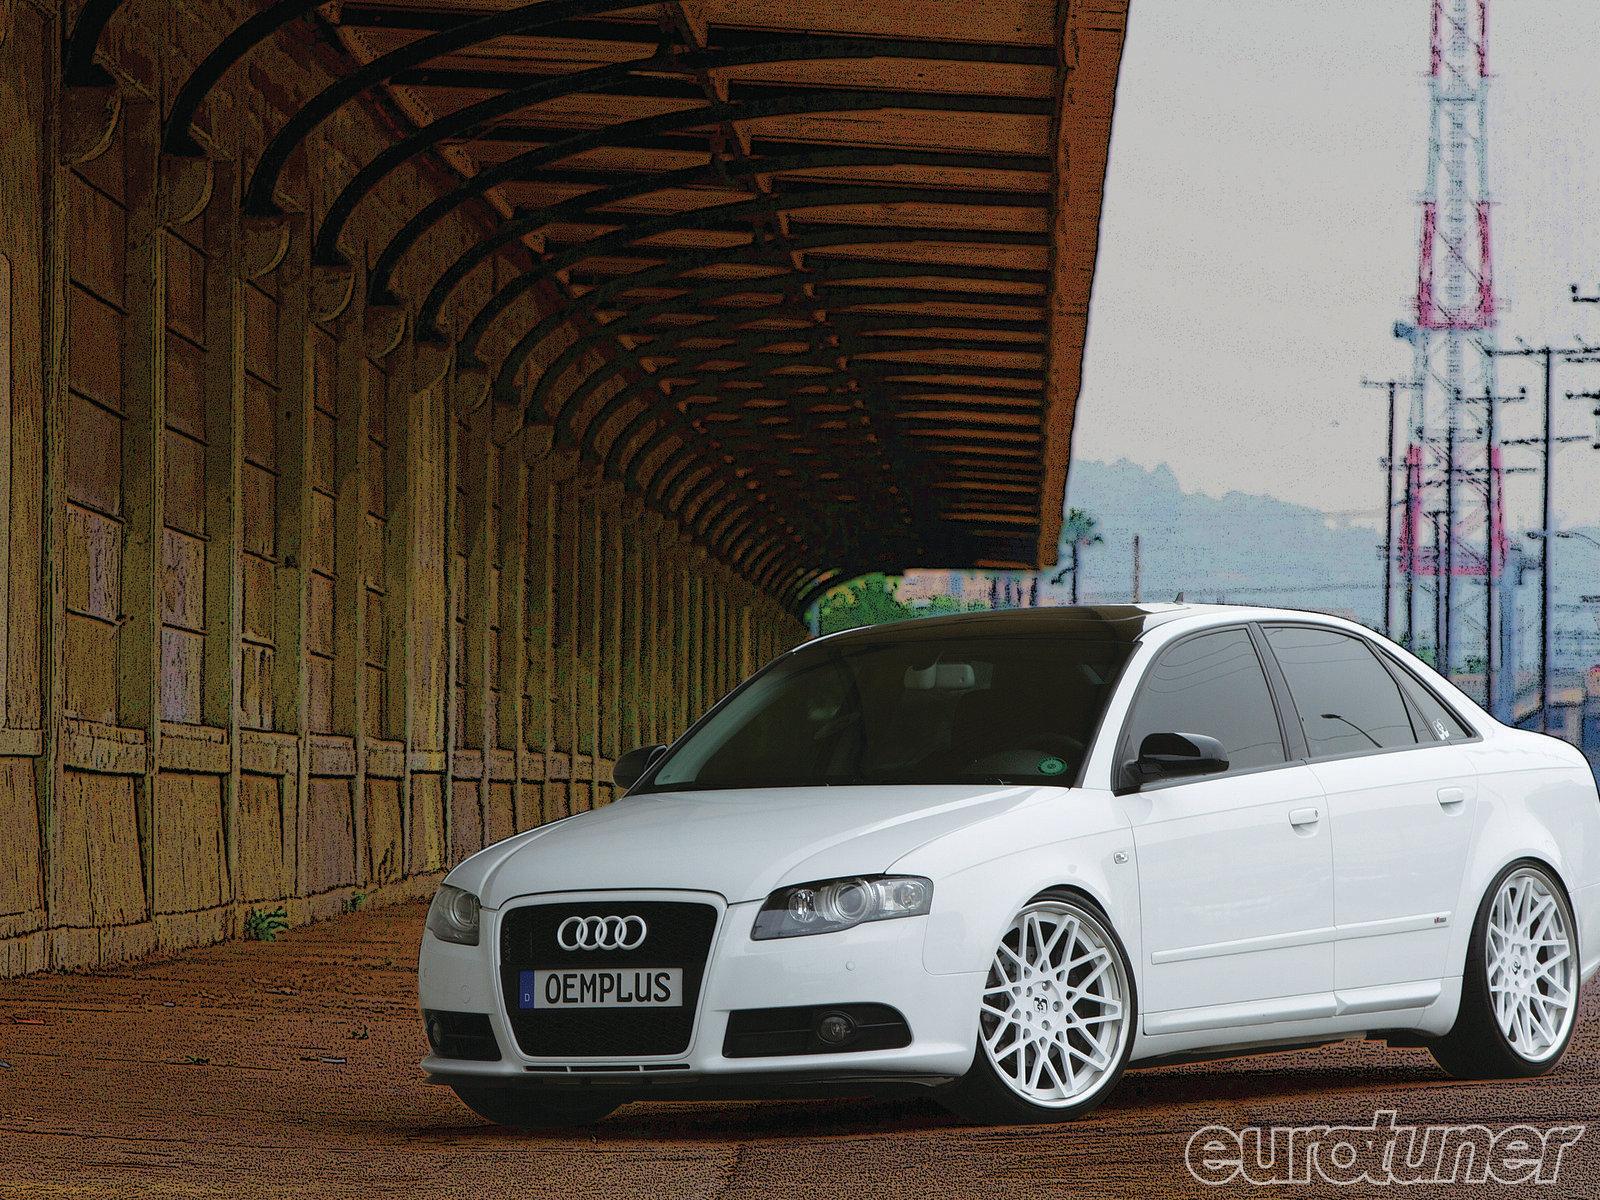 2007 Audi A4 2 0T - Section Zero - Eurotuner Magazine